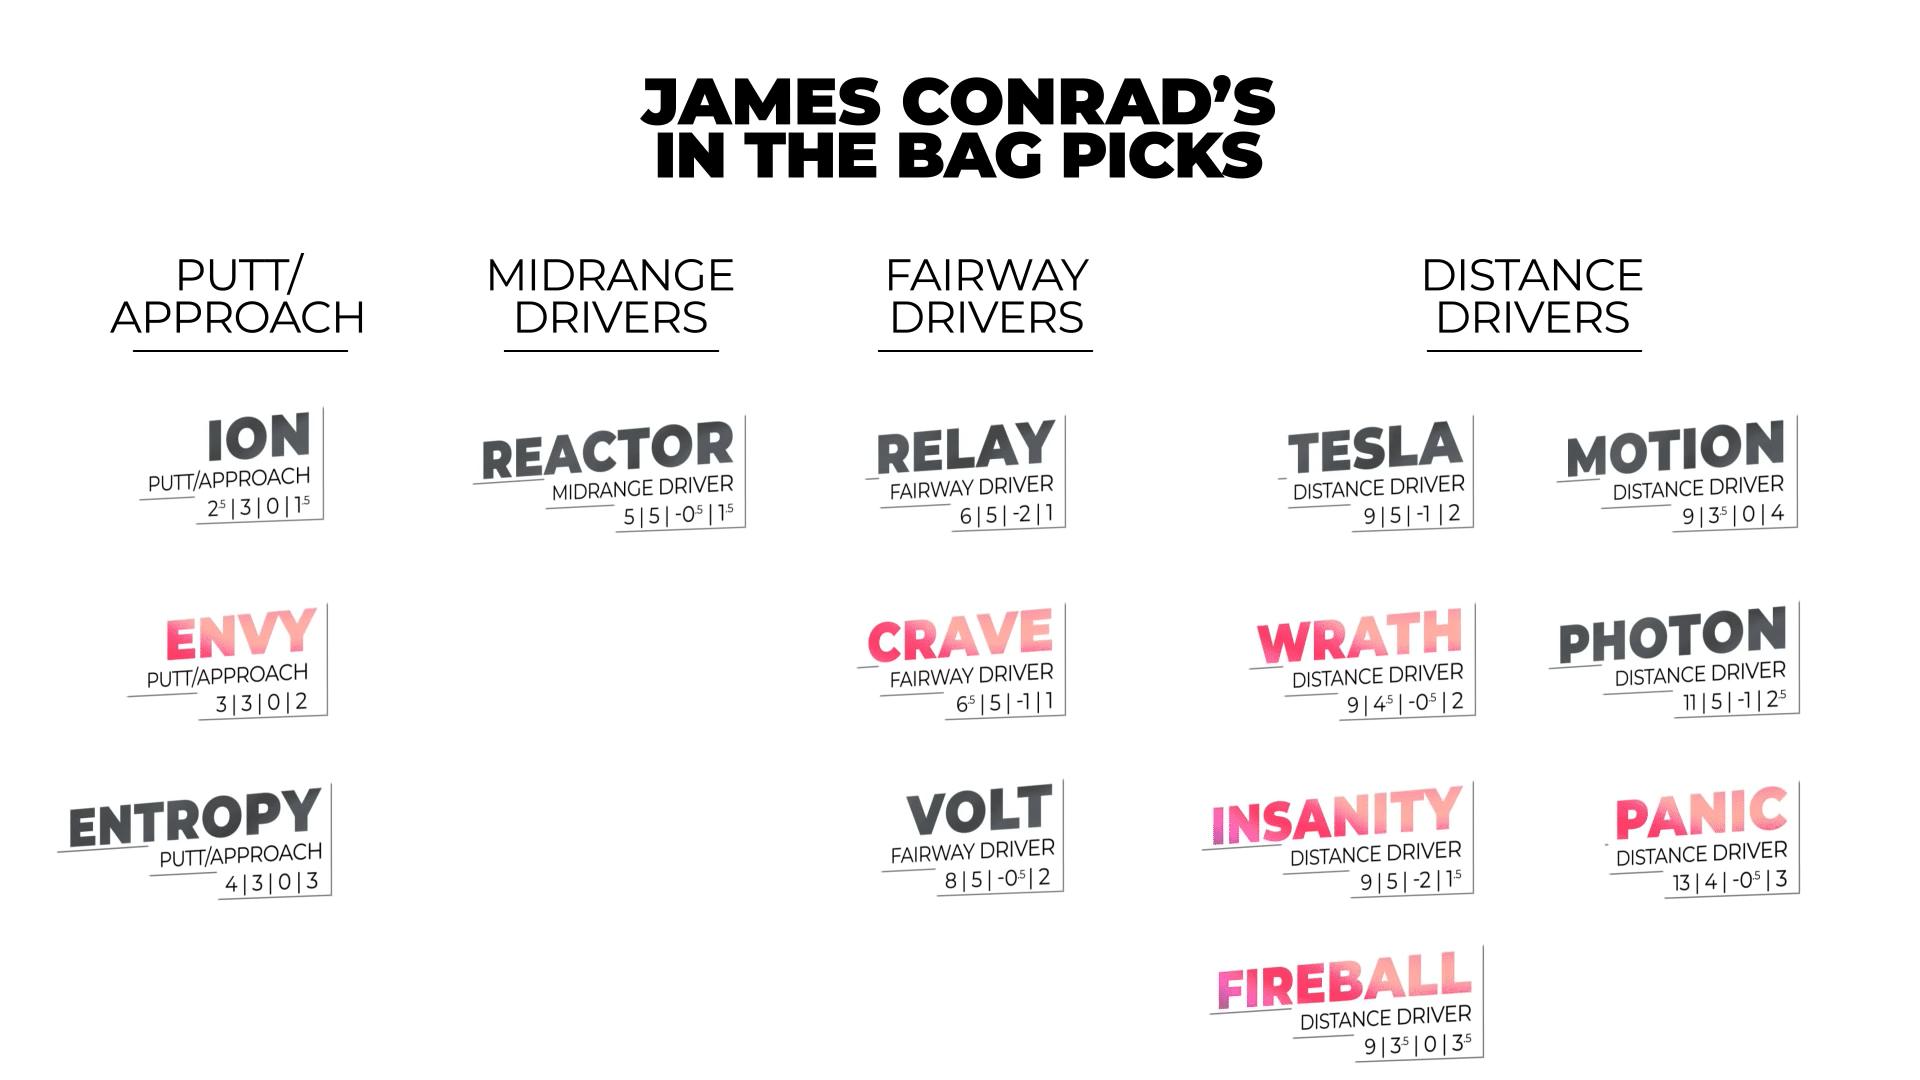 James conrad in the bag 2021